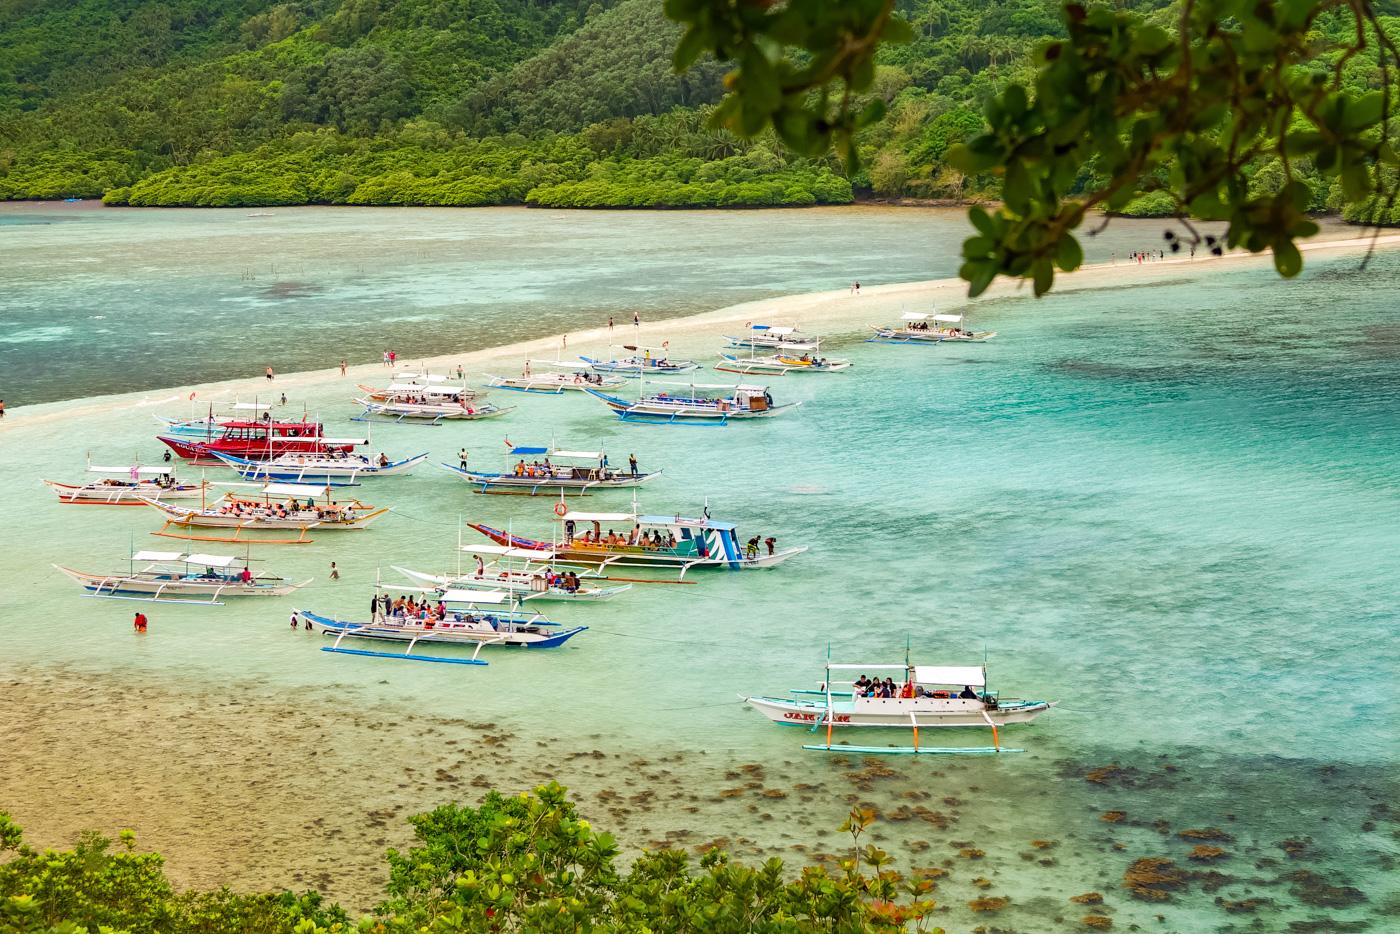 Snake Island der Islandhopping Tour B - El Nido, Philippinen